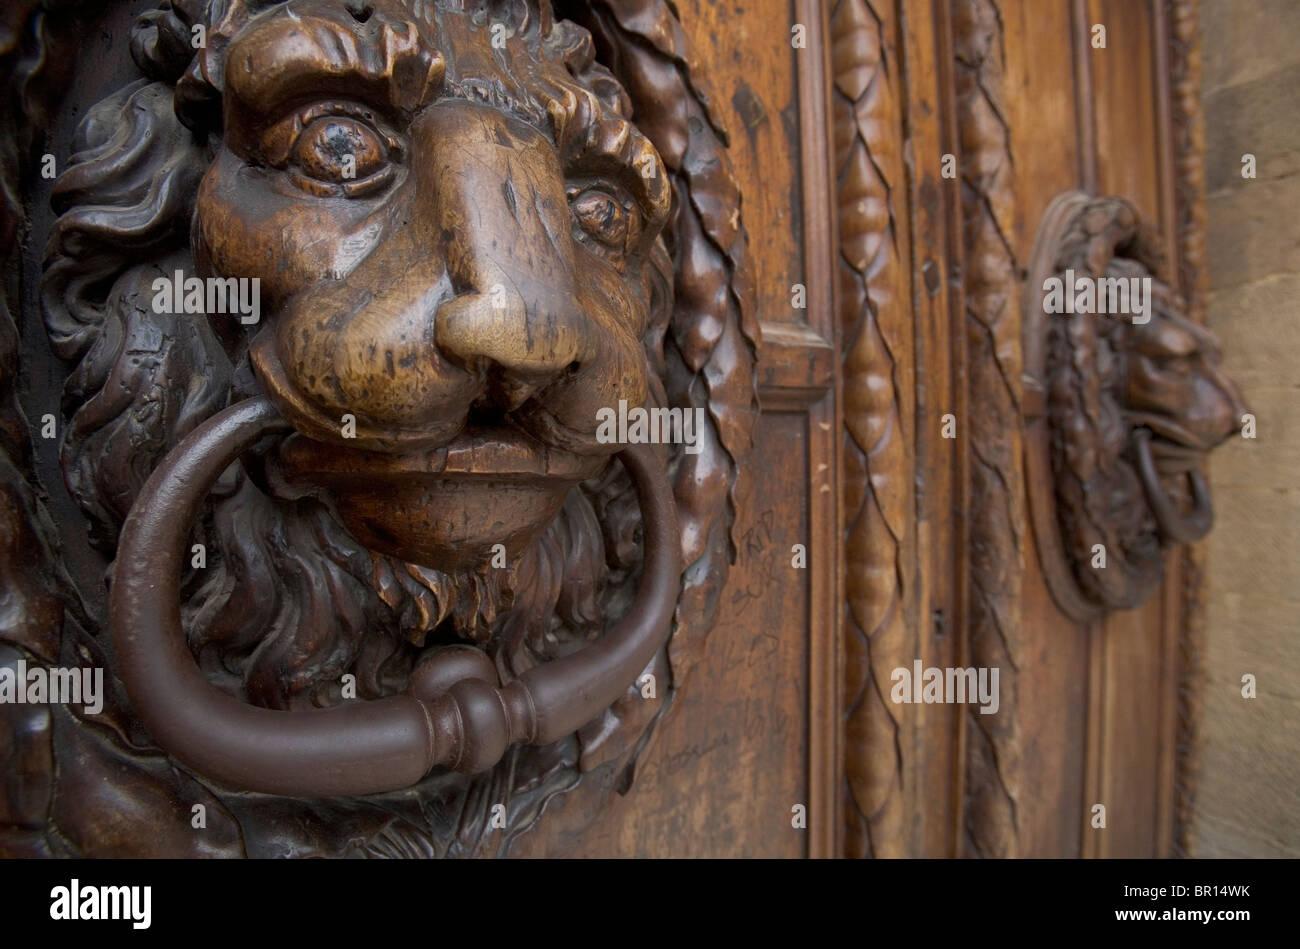 A Carved Wooden Lion Door Knocker On A Large Wooden Door In  Aix En Provence, France